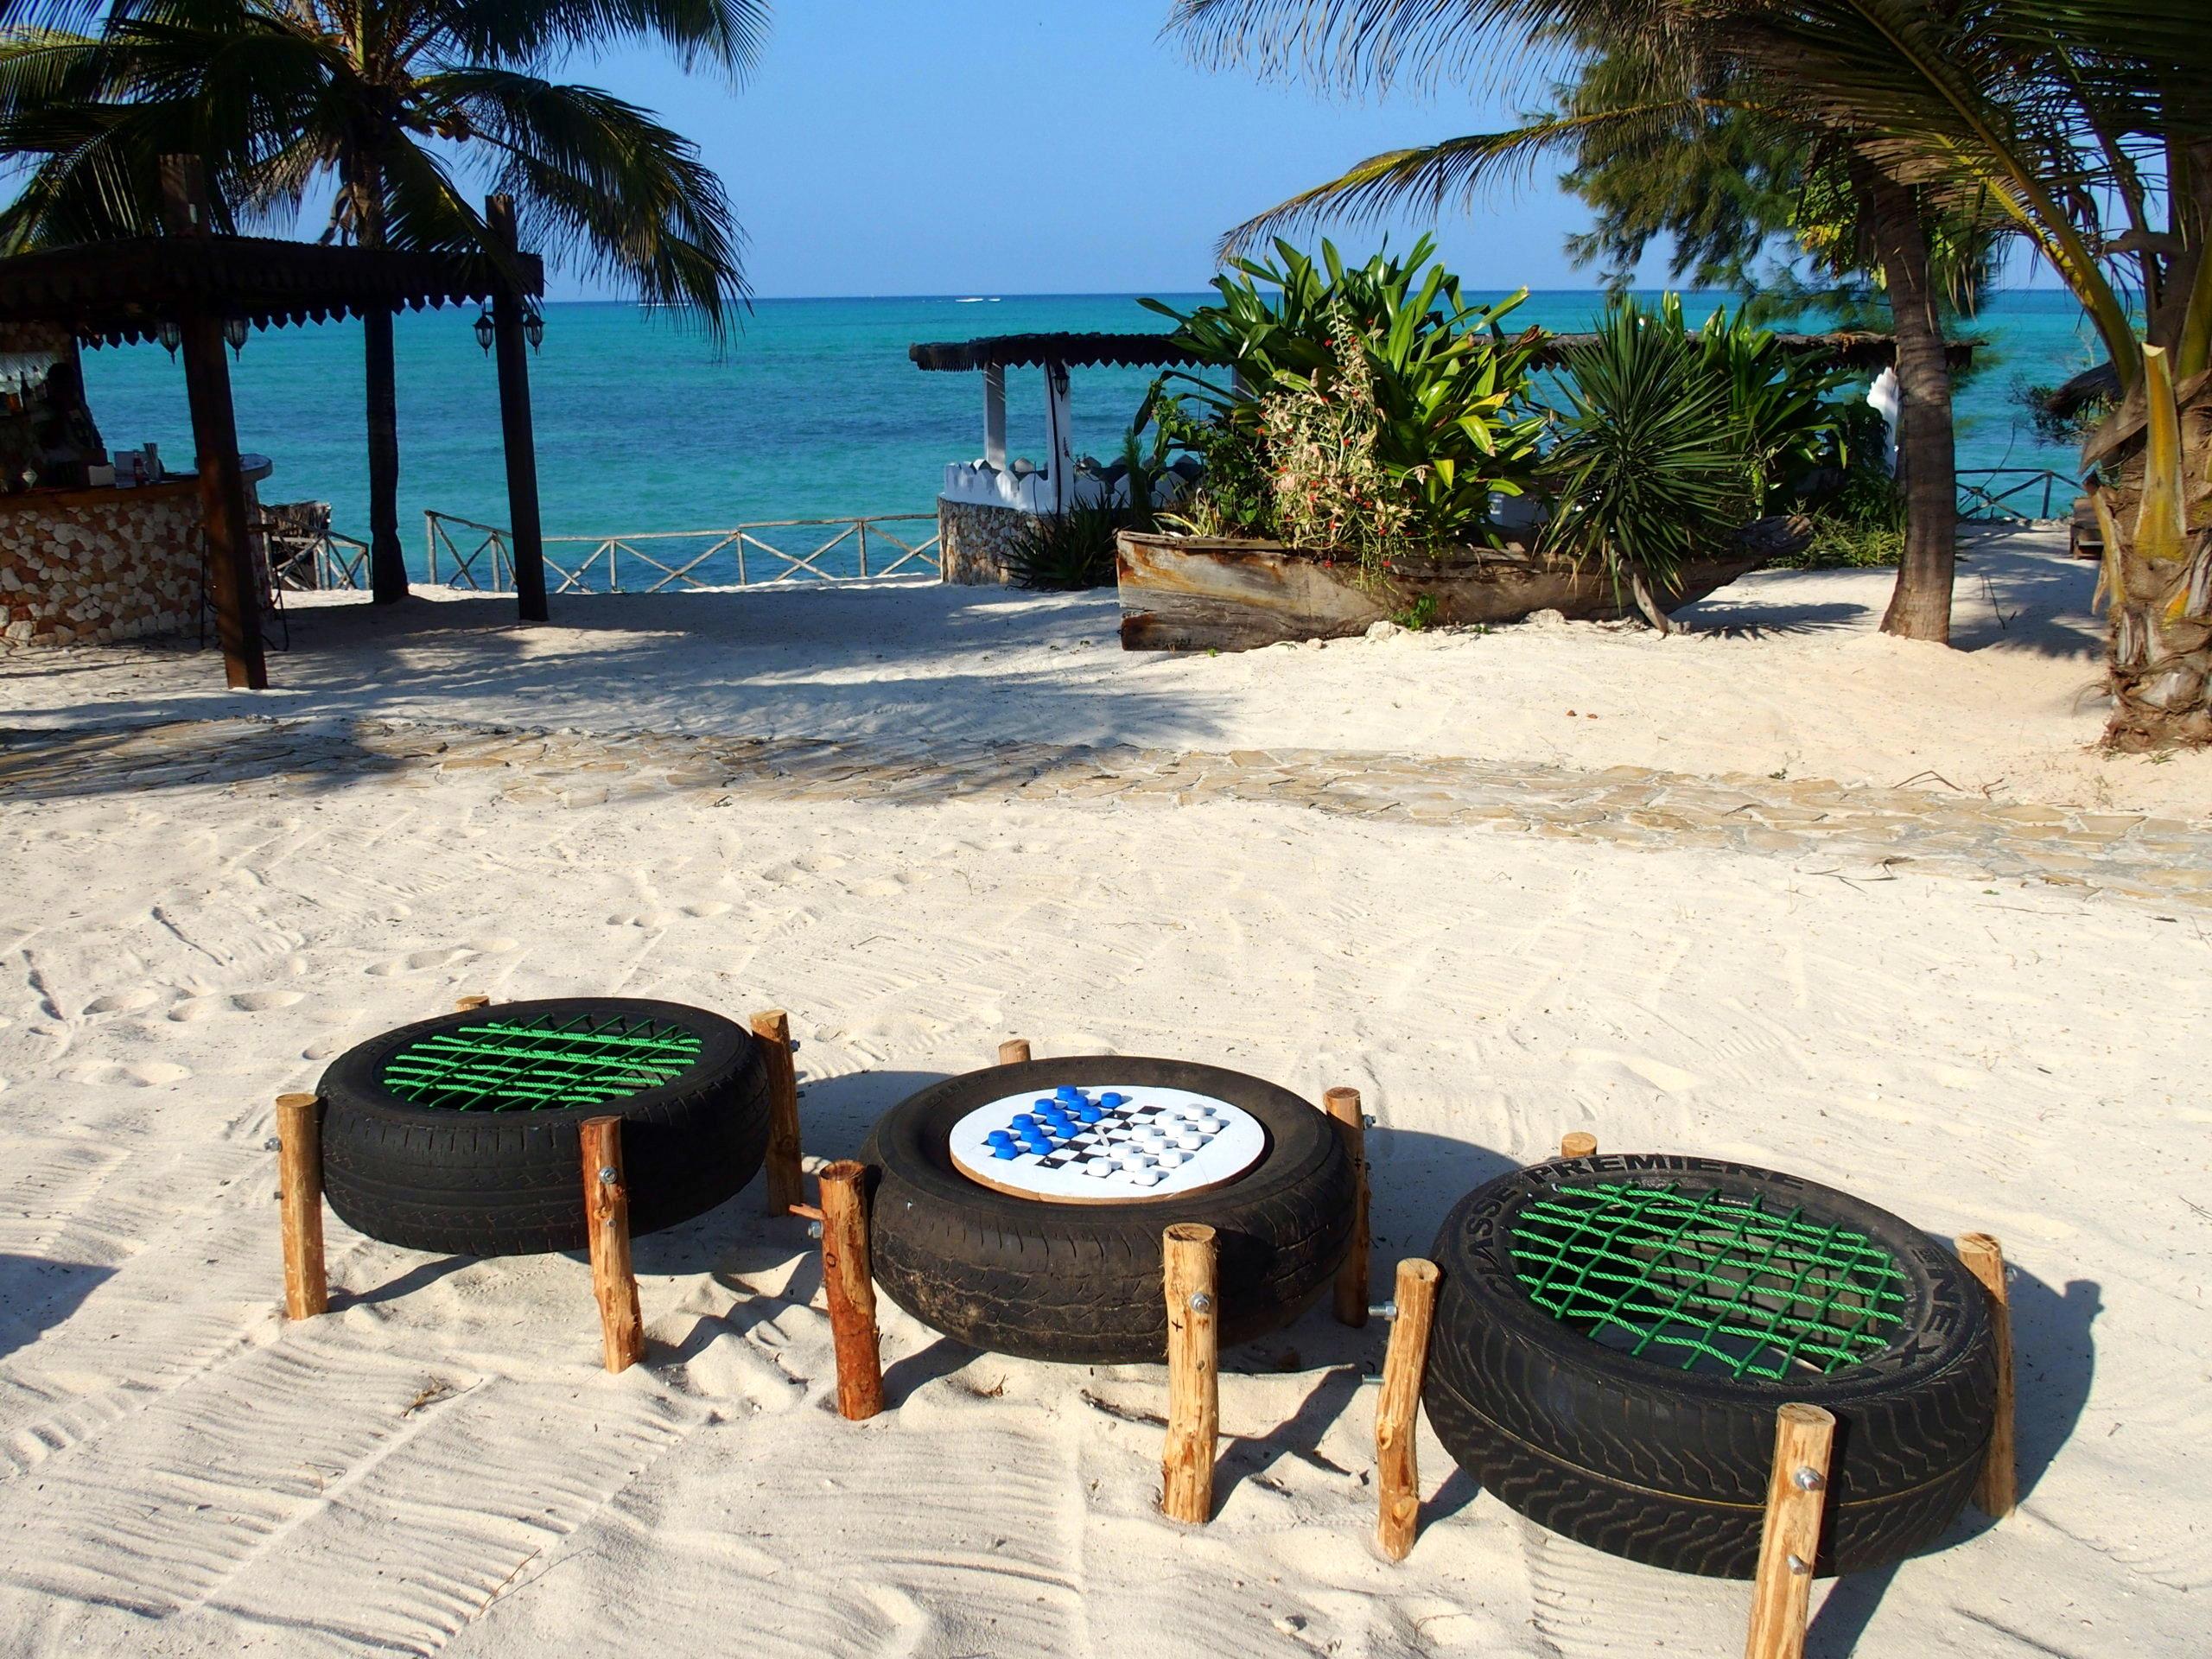 Jeu de dames artisanal hotel Seasons lodge face à la mer Pongwe Zanzibar